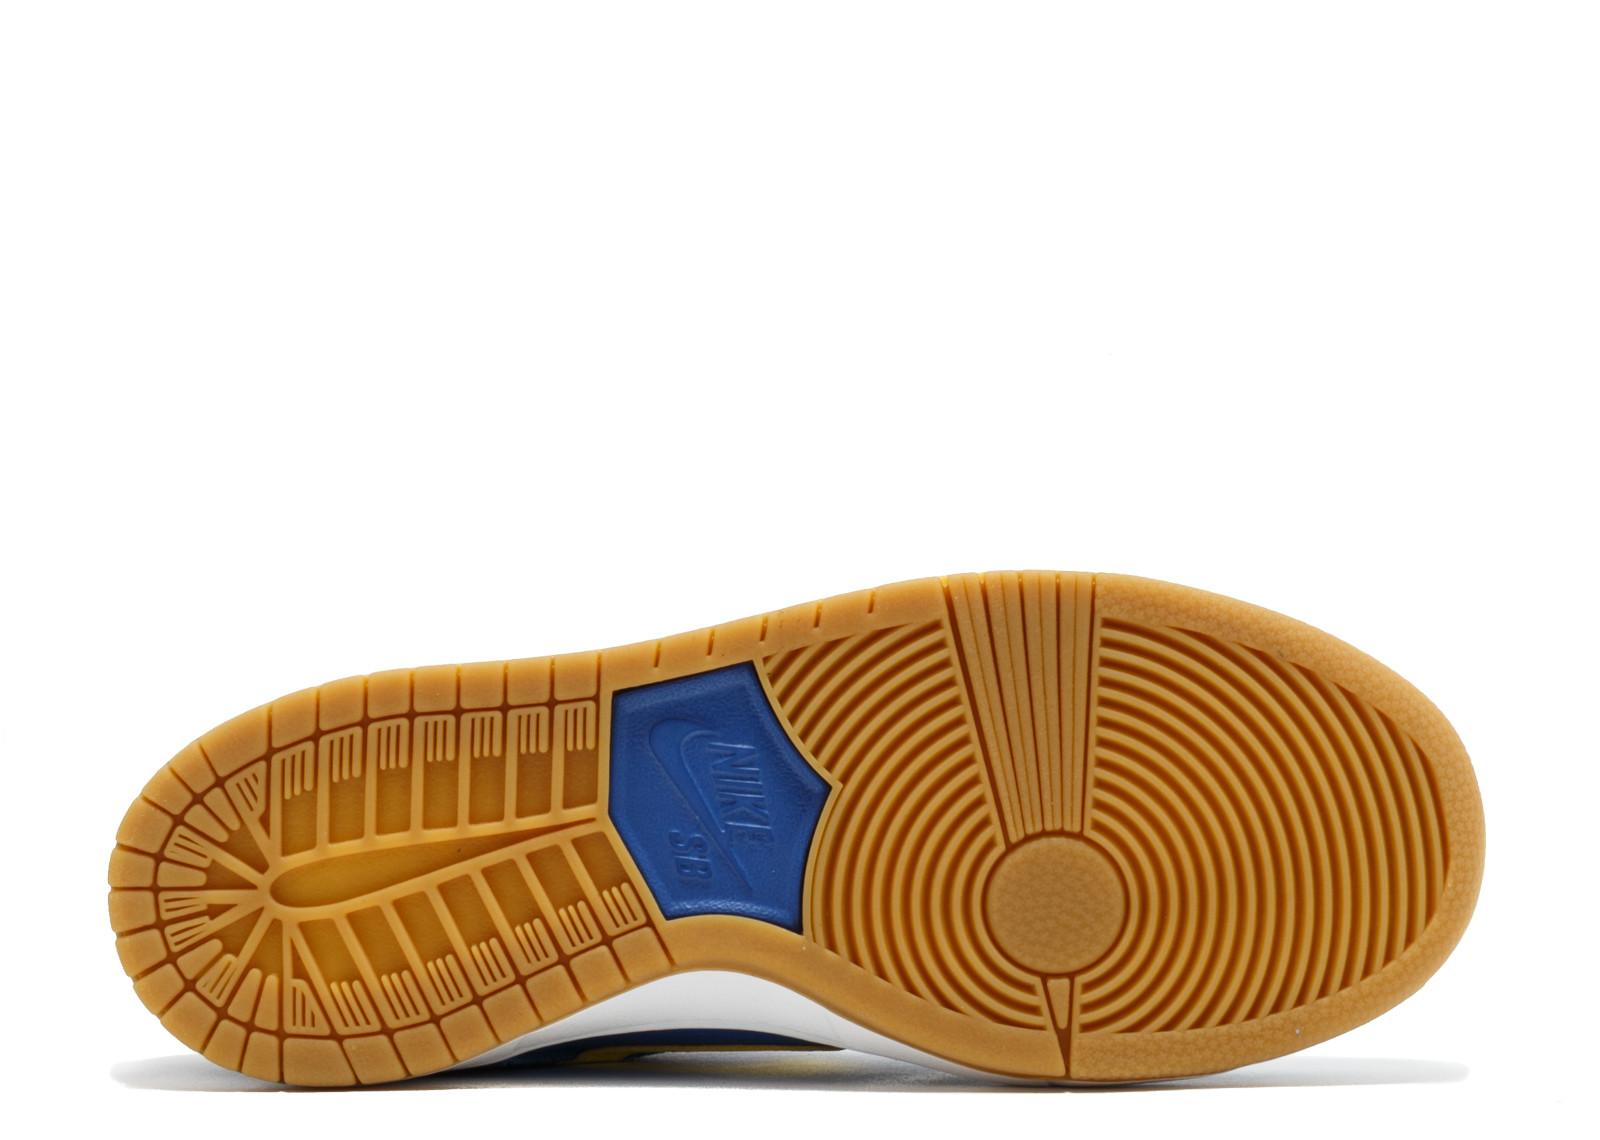 release date 105c8 35a0d Nike Sb Zoom Dunk Low Pro Boca Jr Lightening White Royal Varsity 854866-471